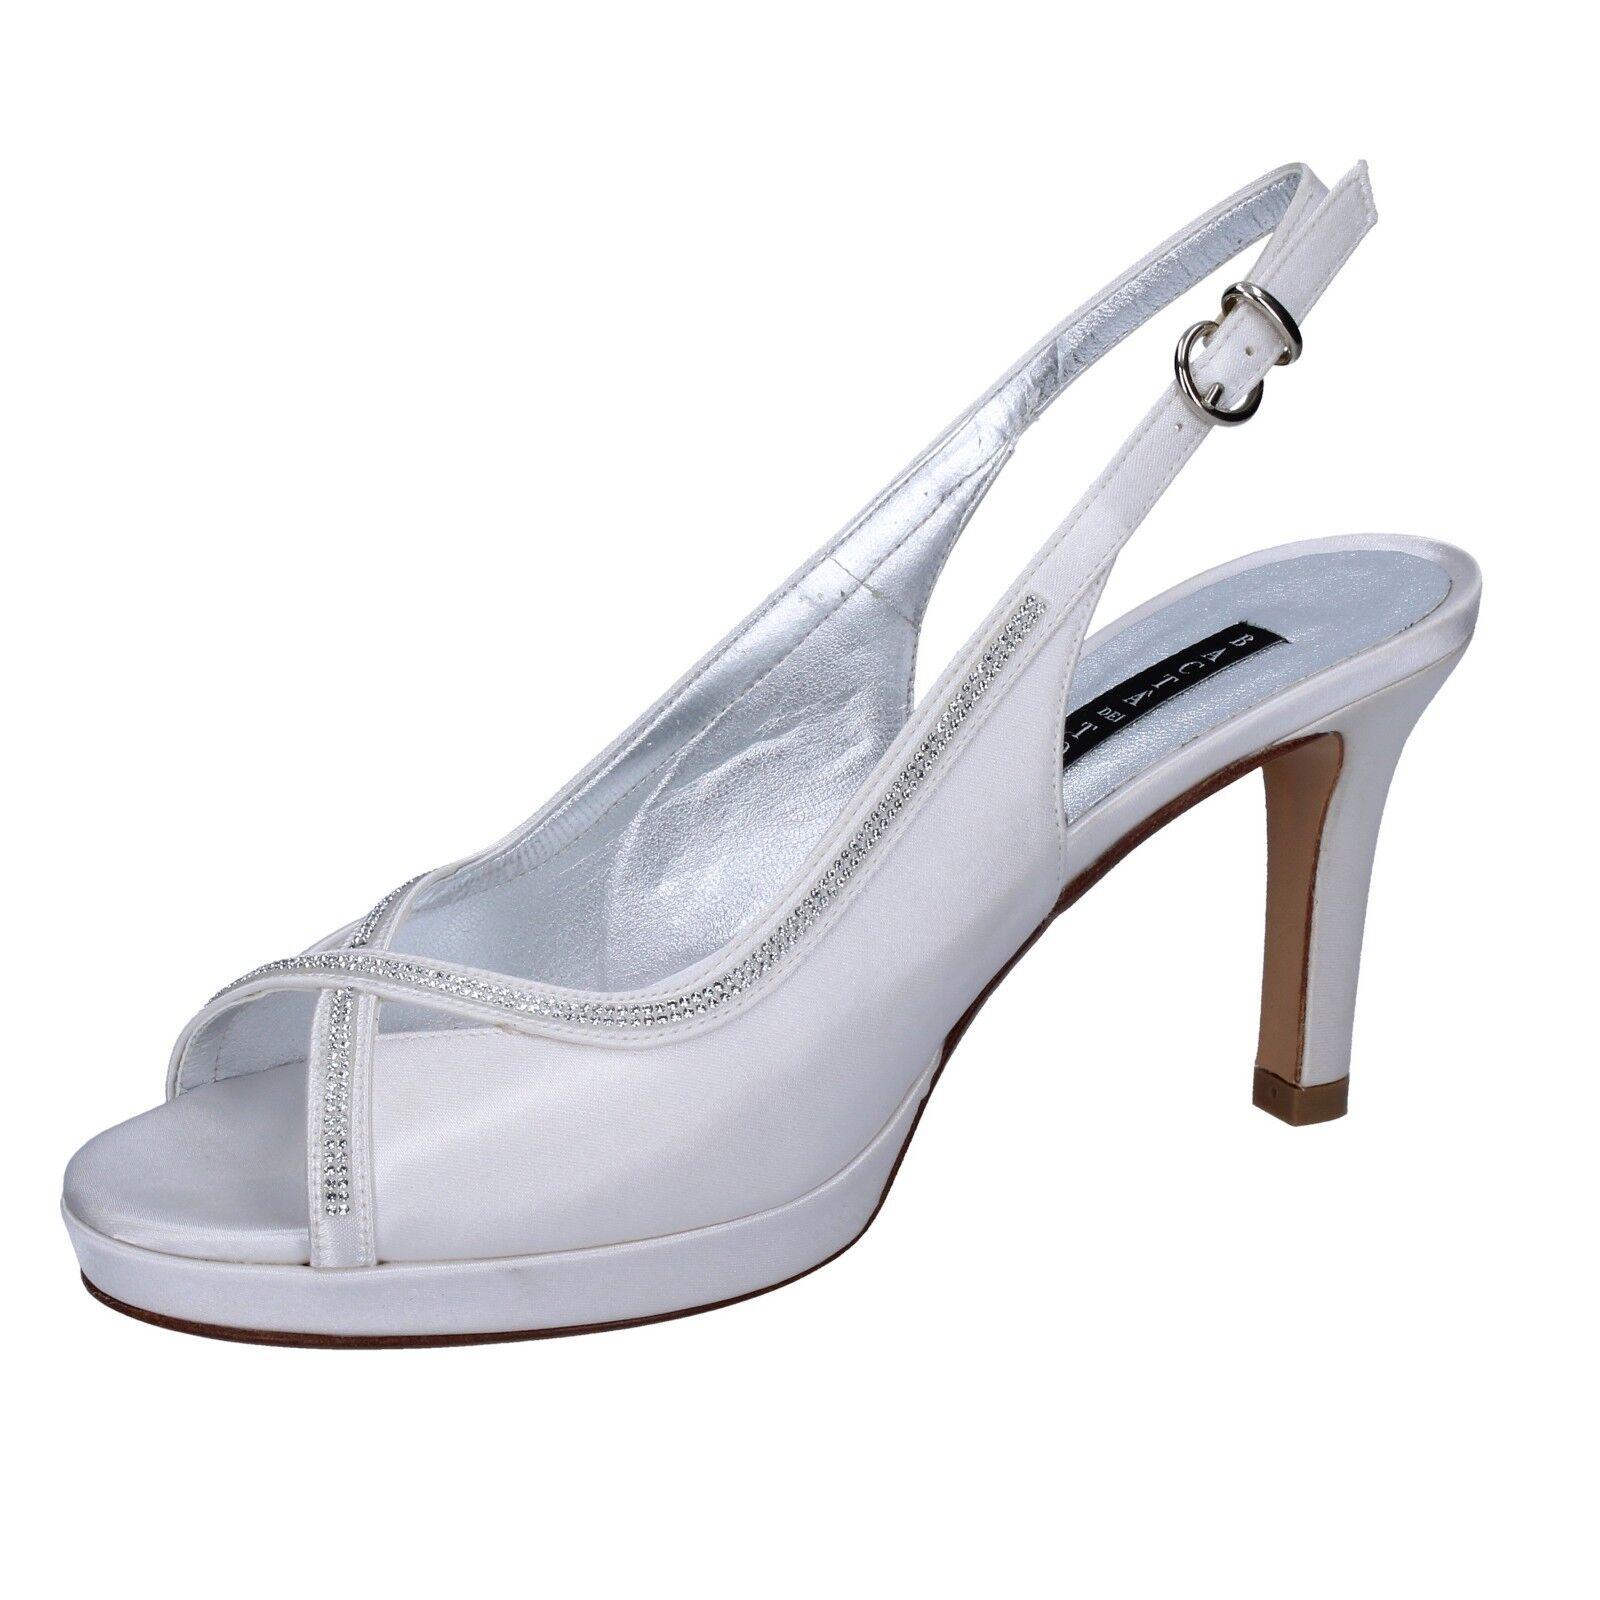 Chaussures Femmes Bacta de toi 37 UE Sandales Blanc strass Satin bt844-37